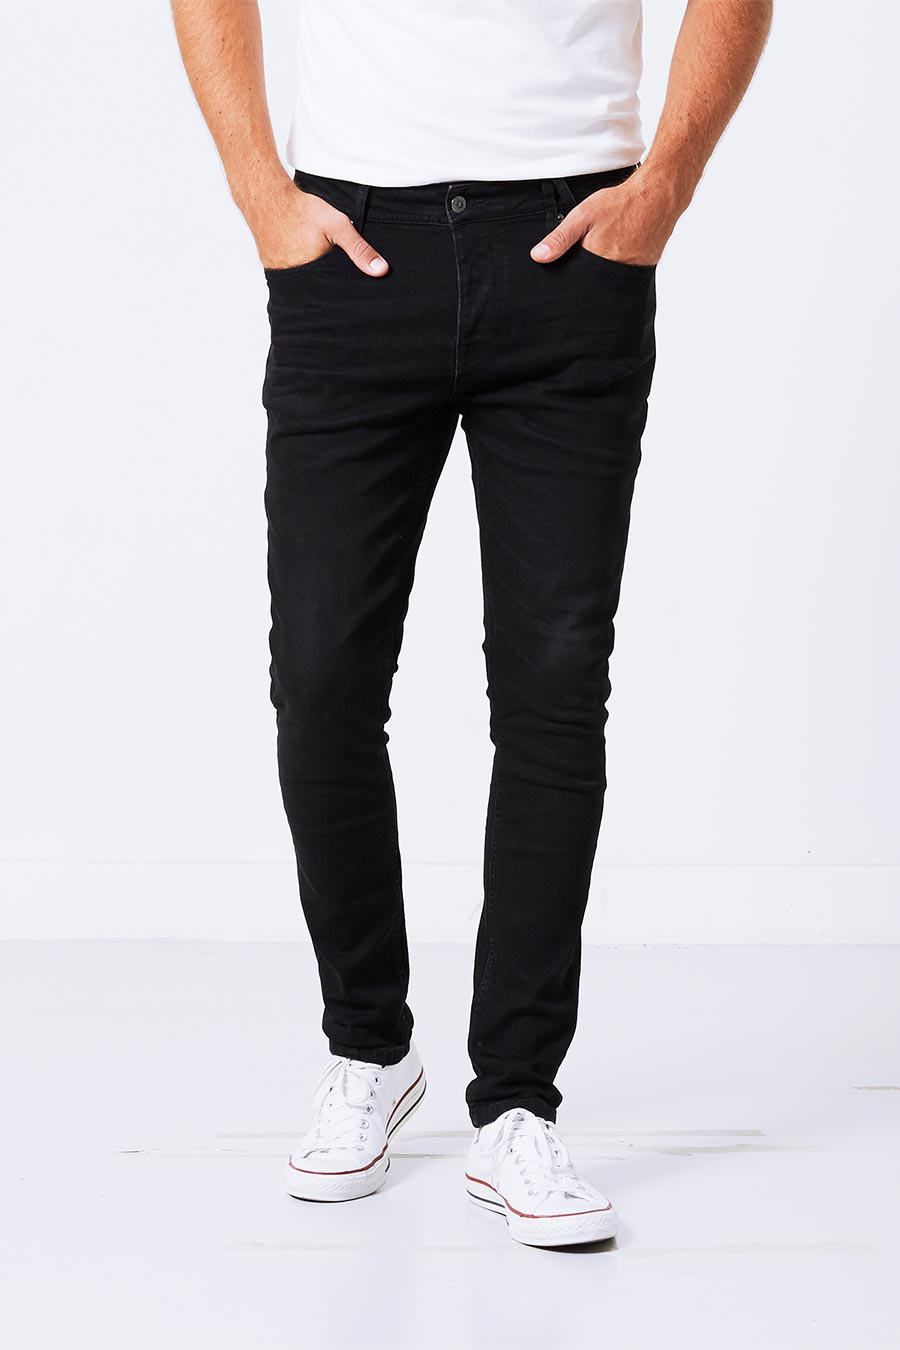 ryan men Jeans